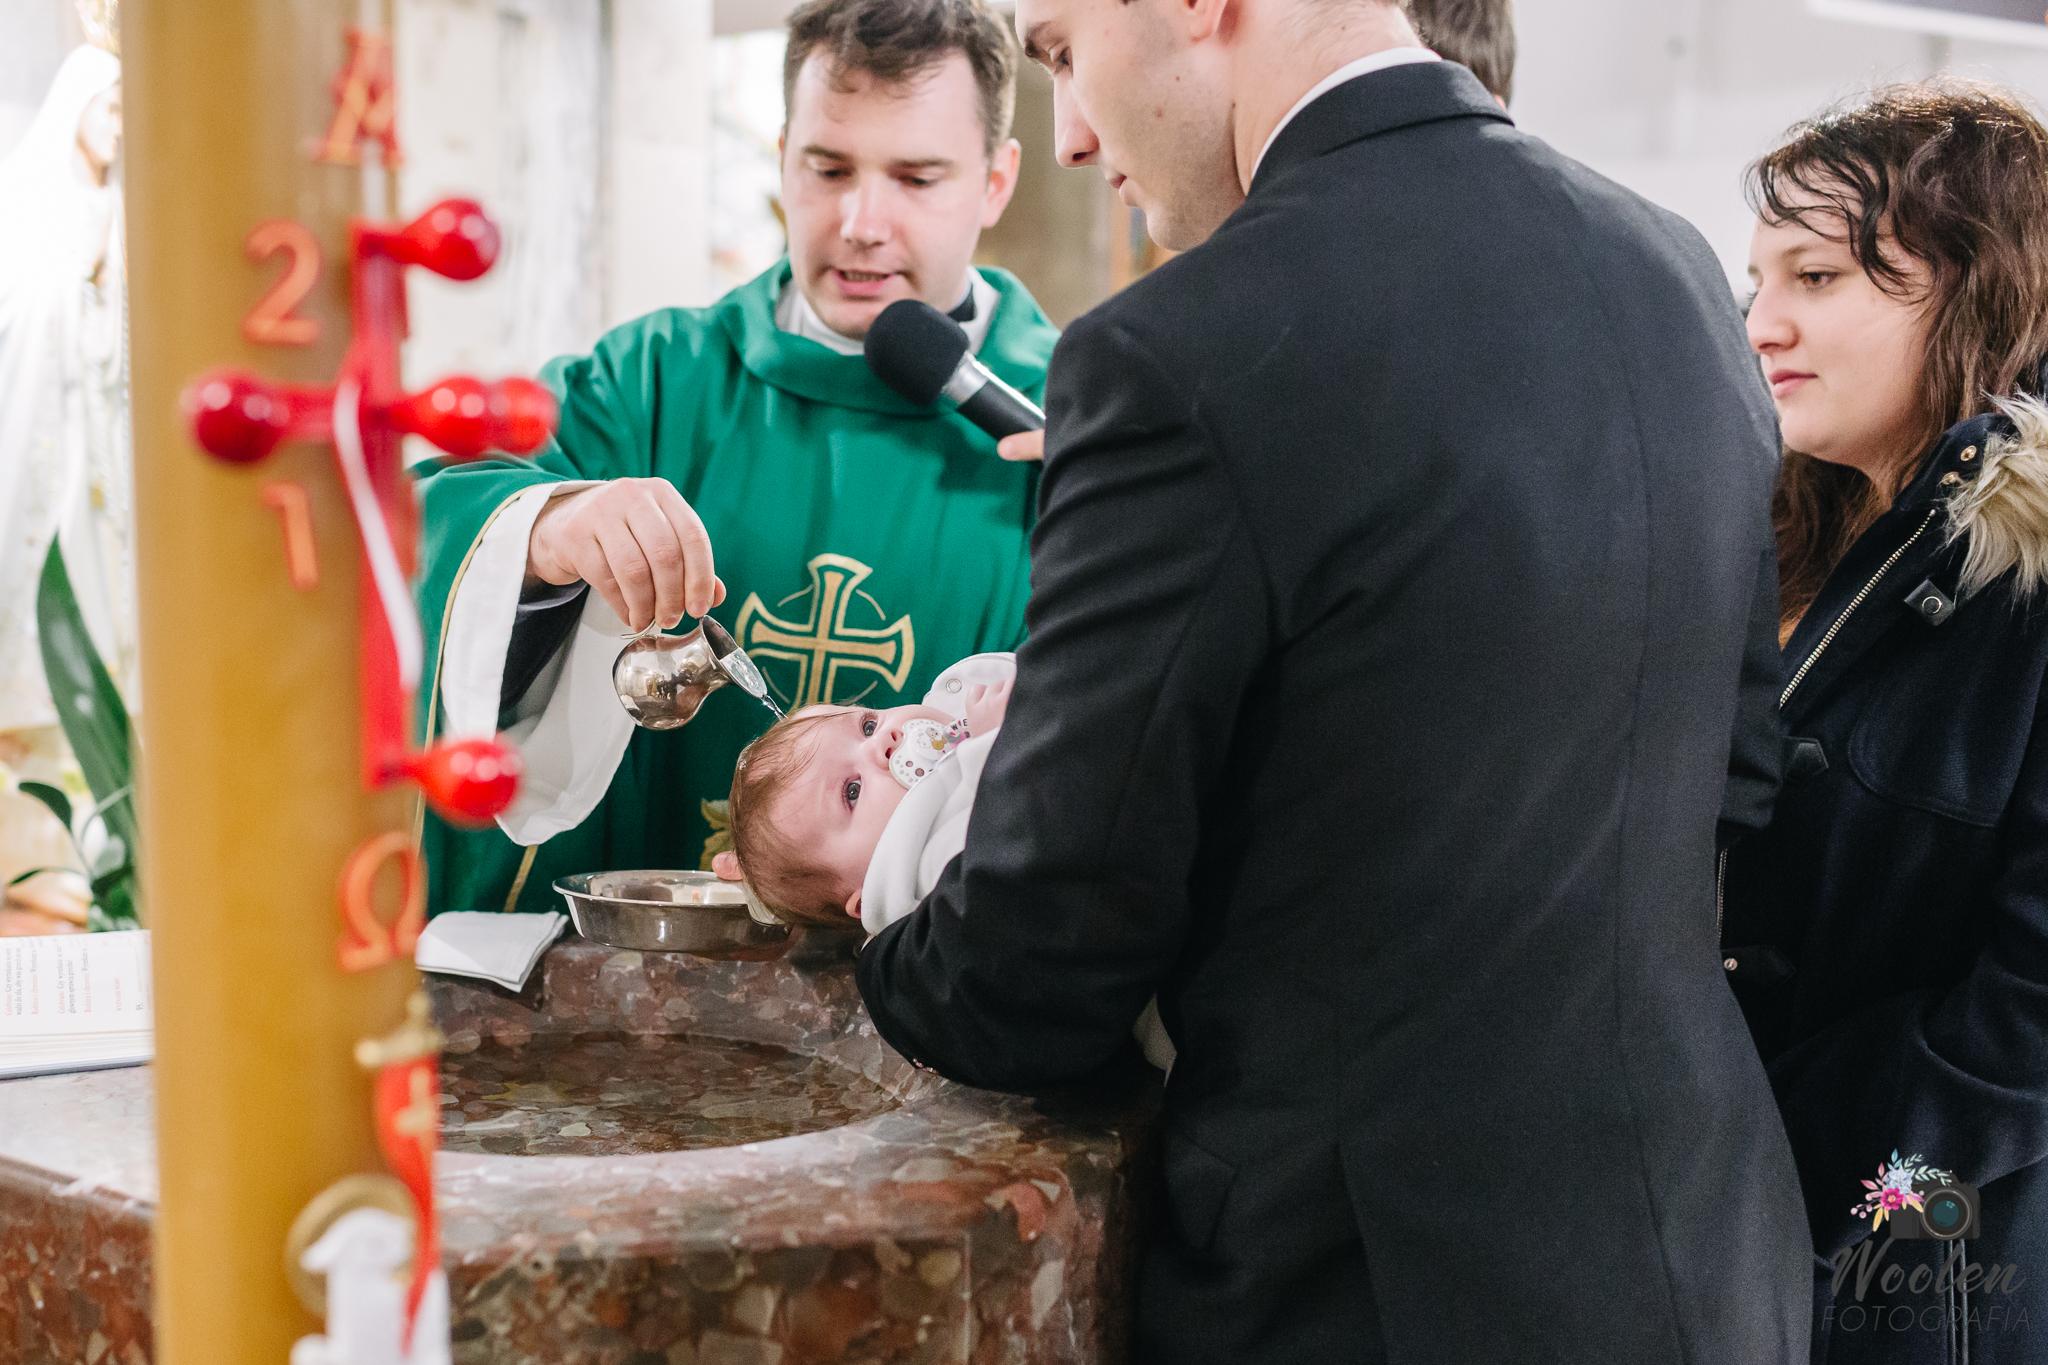 reportaz chrztu swietego lublin